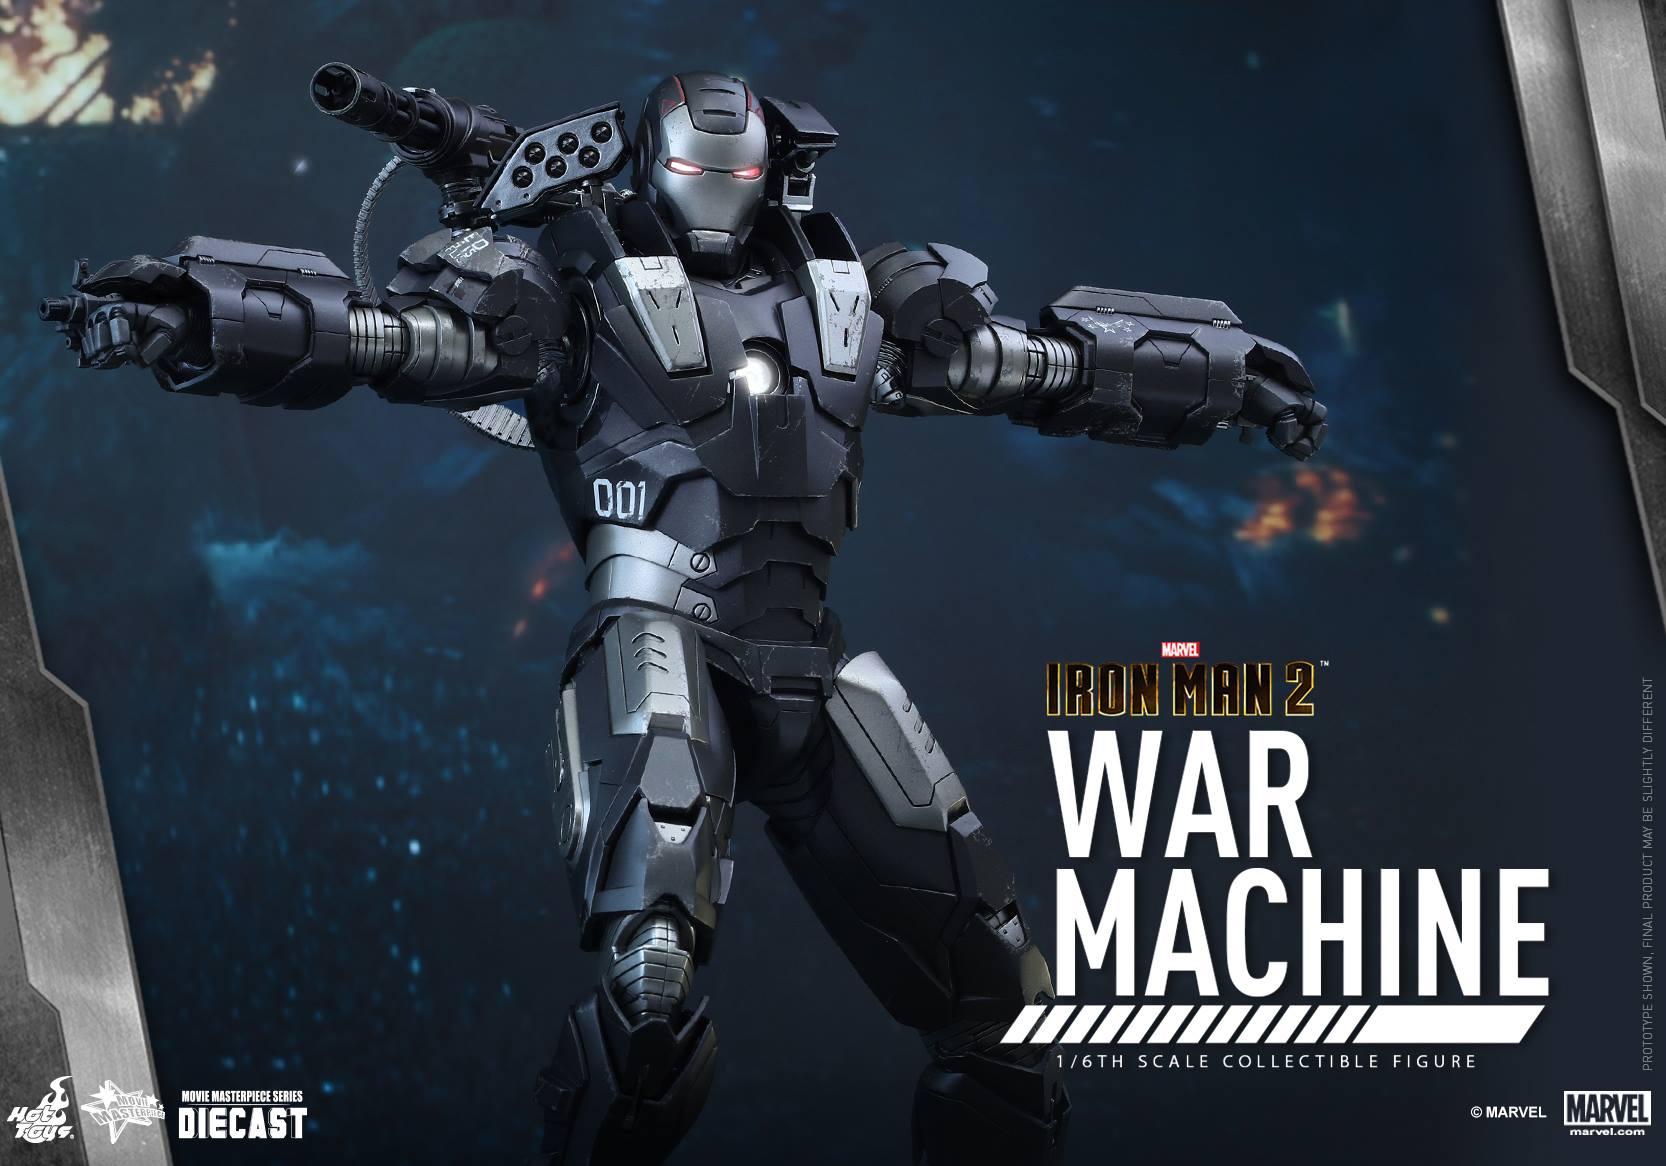 Hot Toys Diecast War Machine from Iron Man 2 | CollectionDX